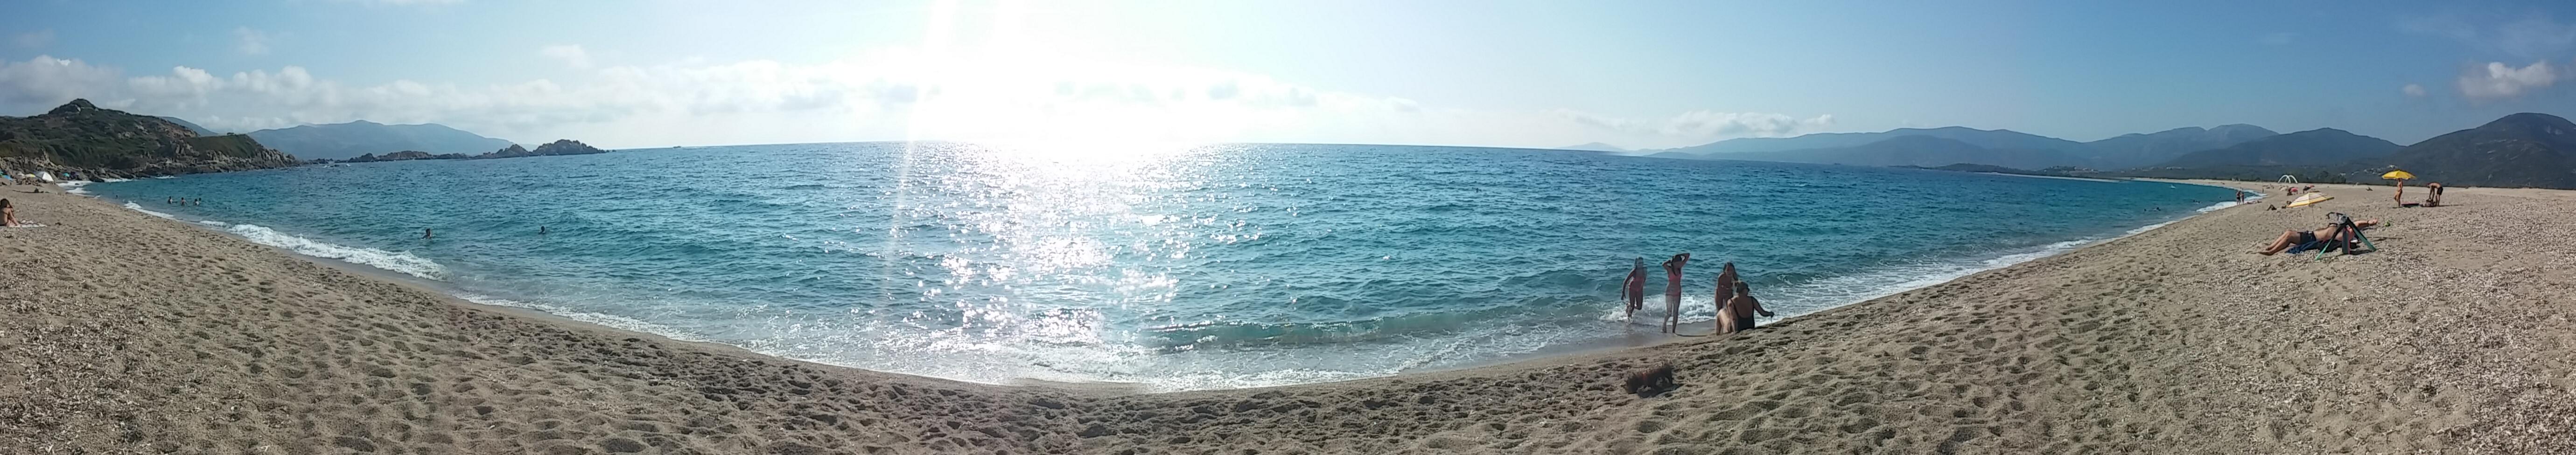 playa-liamone-corcega-panoramica